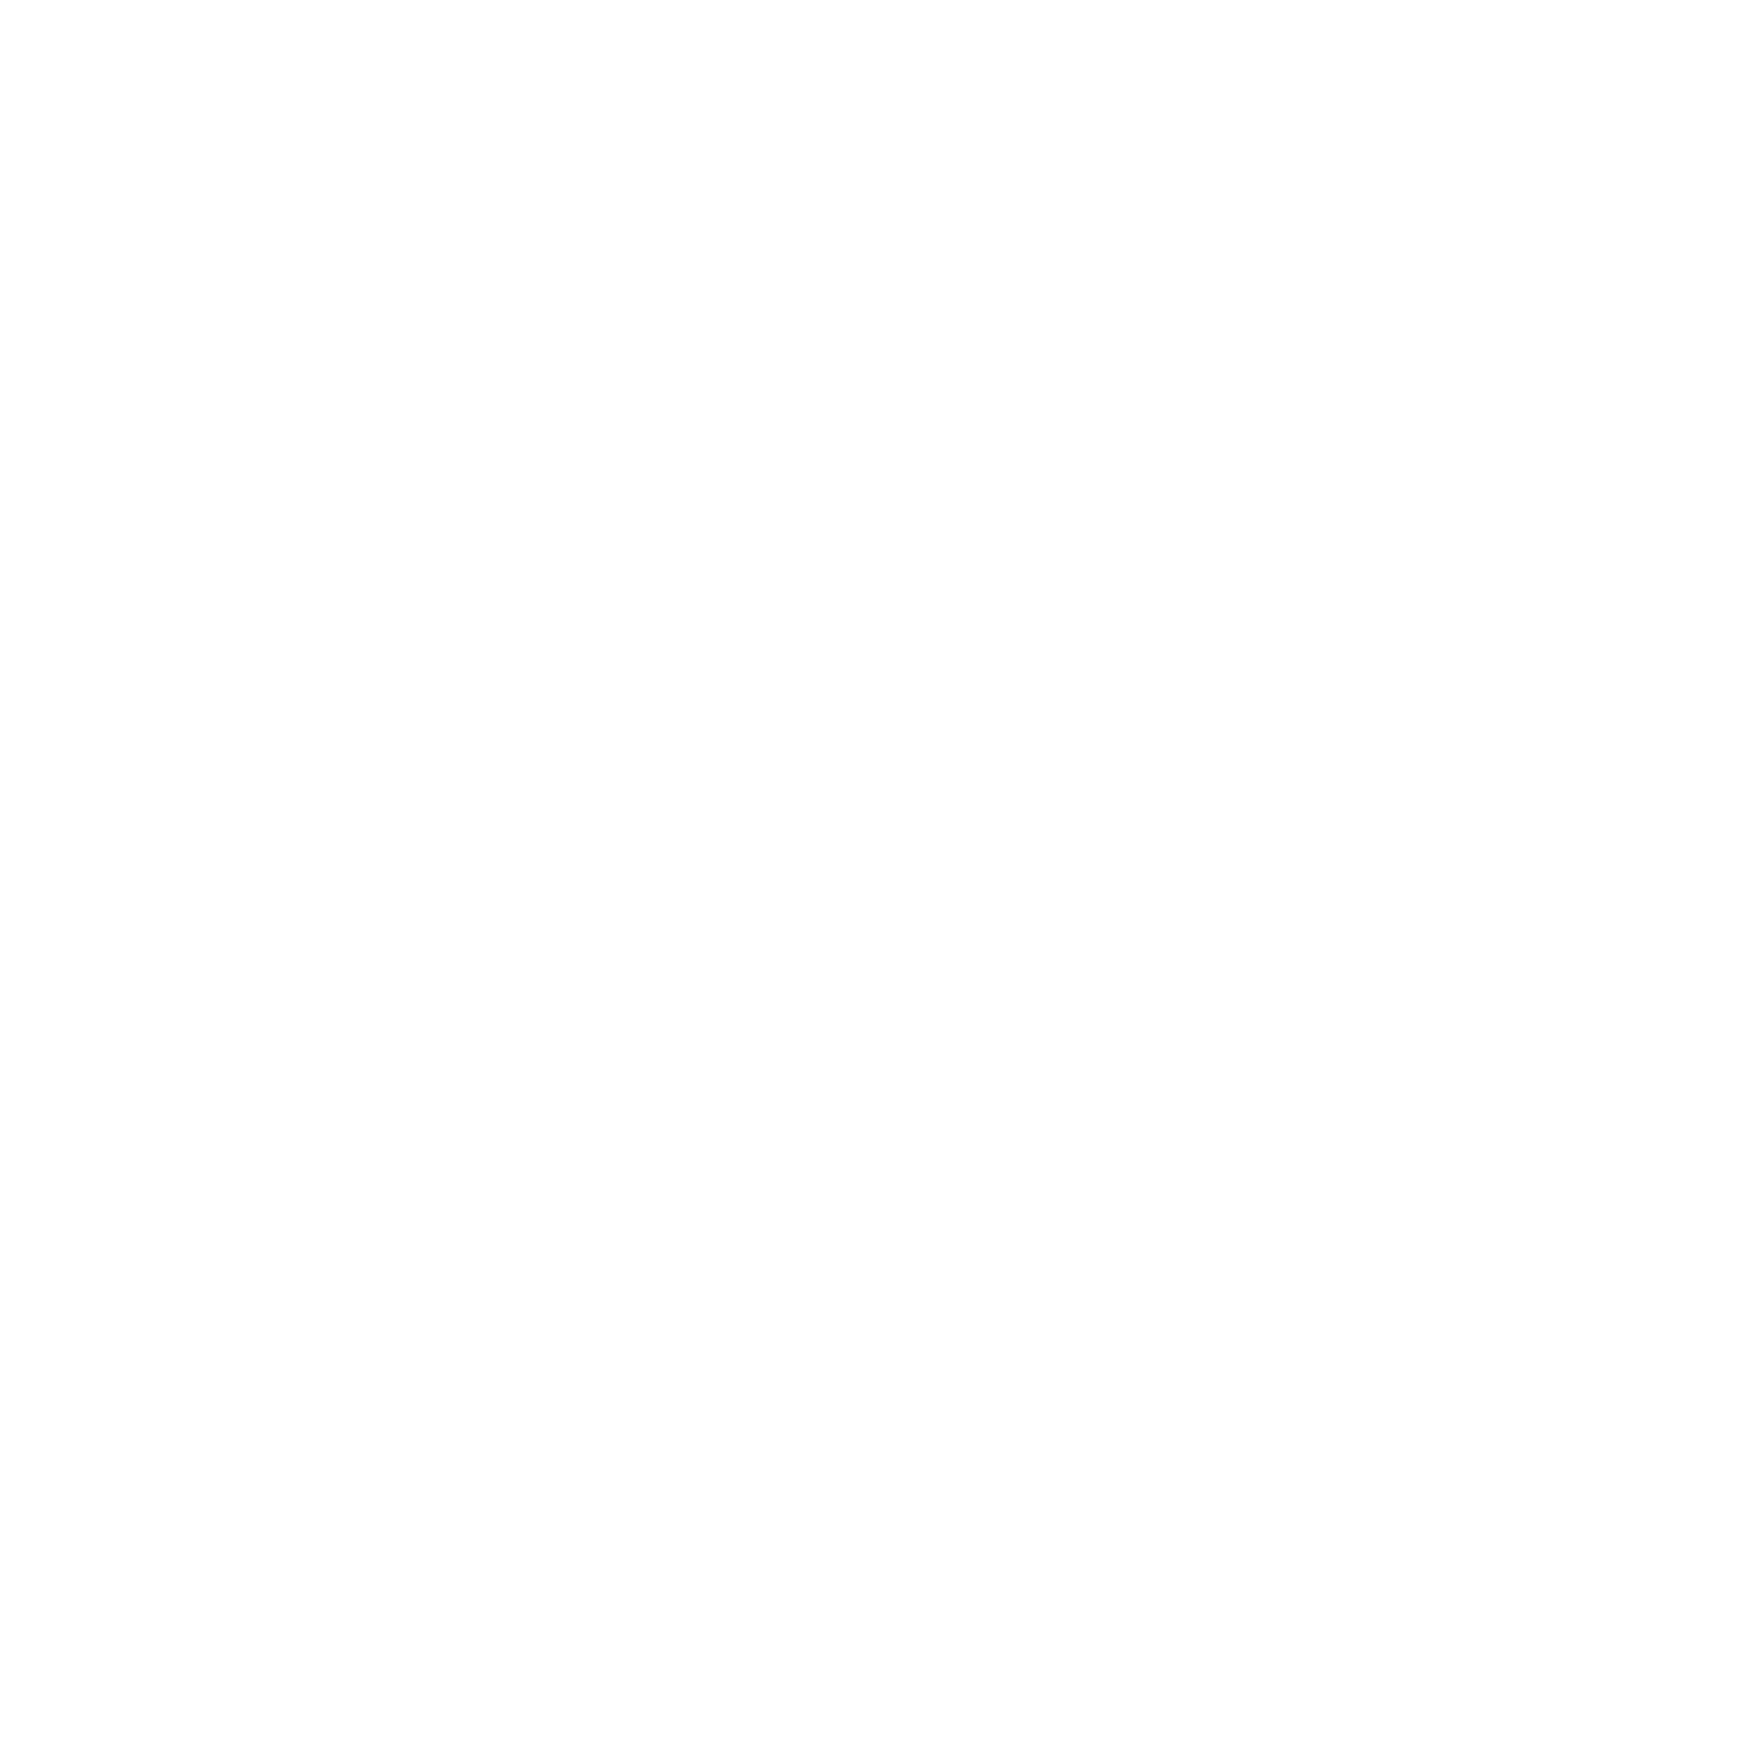 VUSH_Emblem_RGB_Weiss